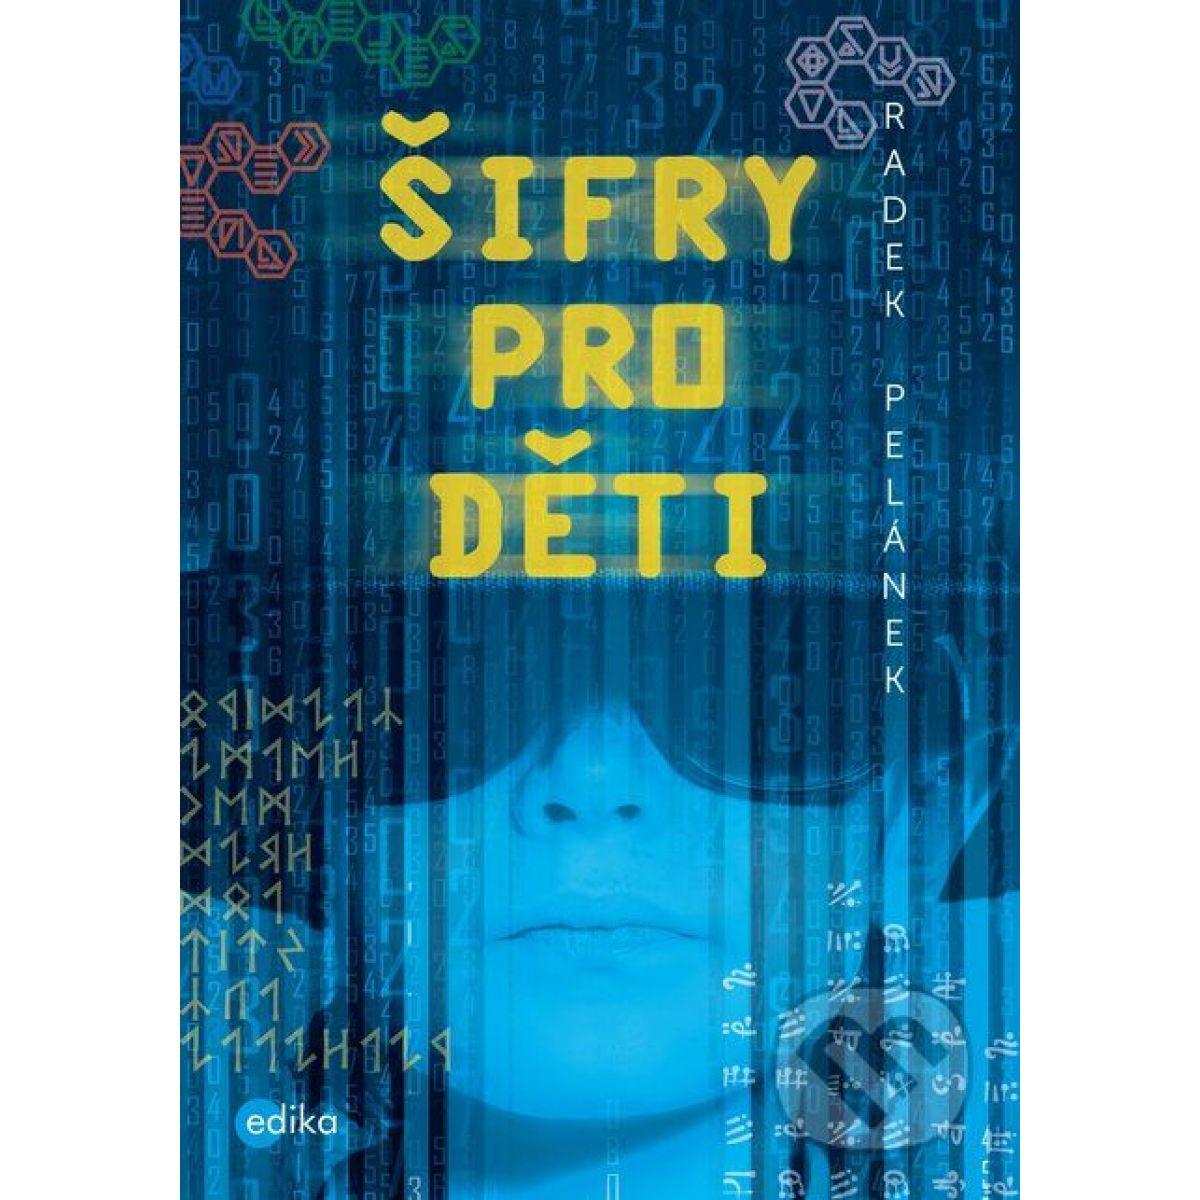 Šifry pre deti Radek Pelánek CZ